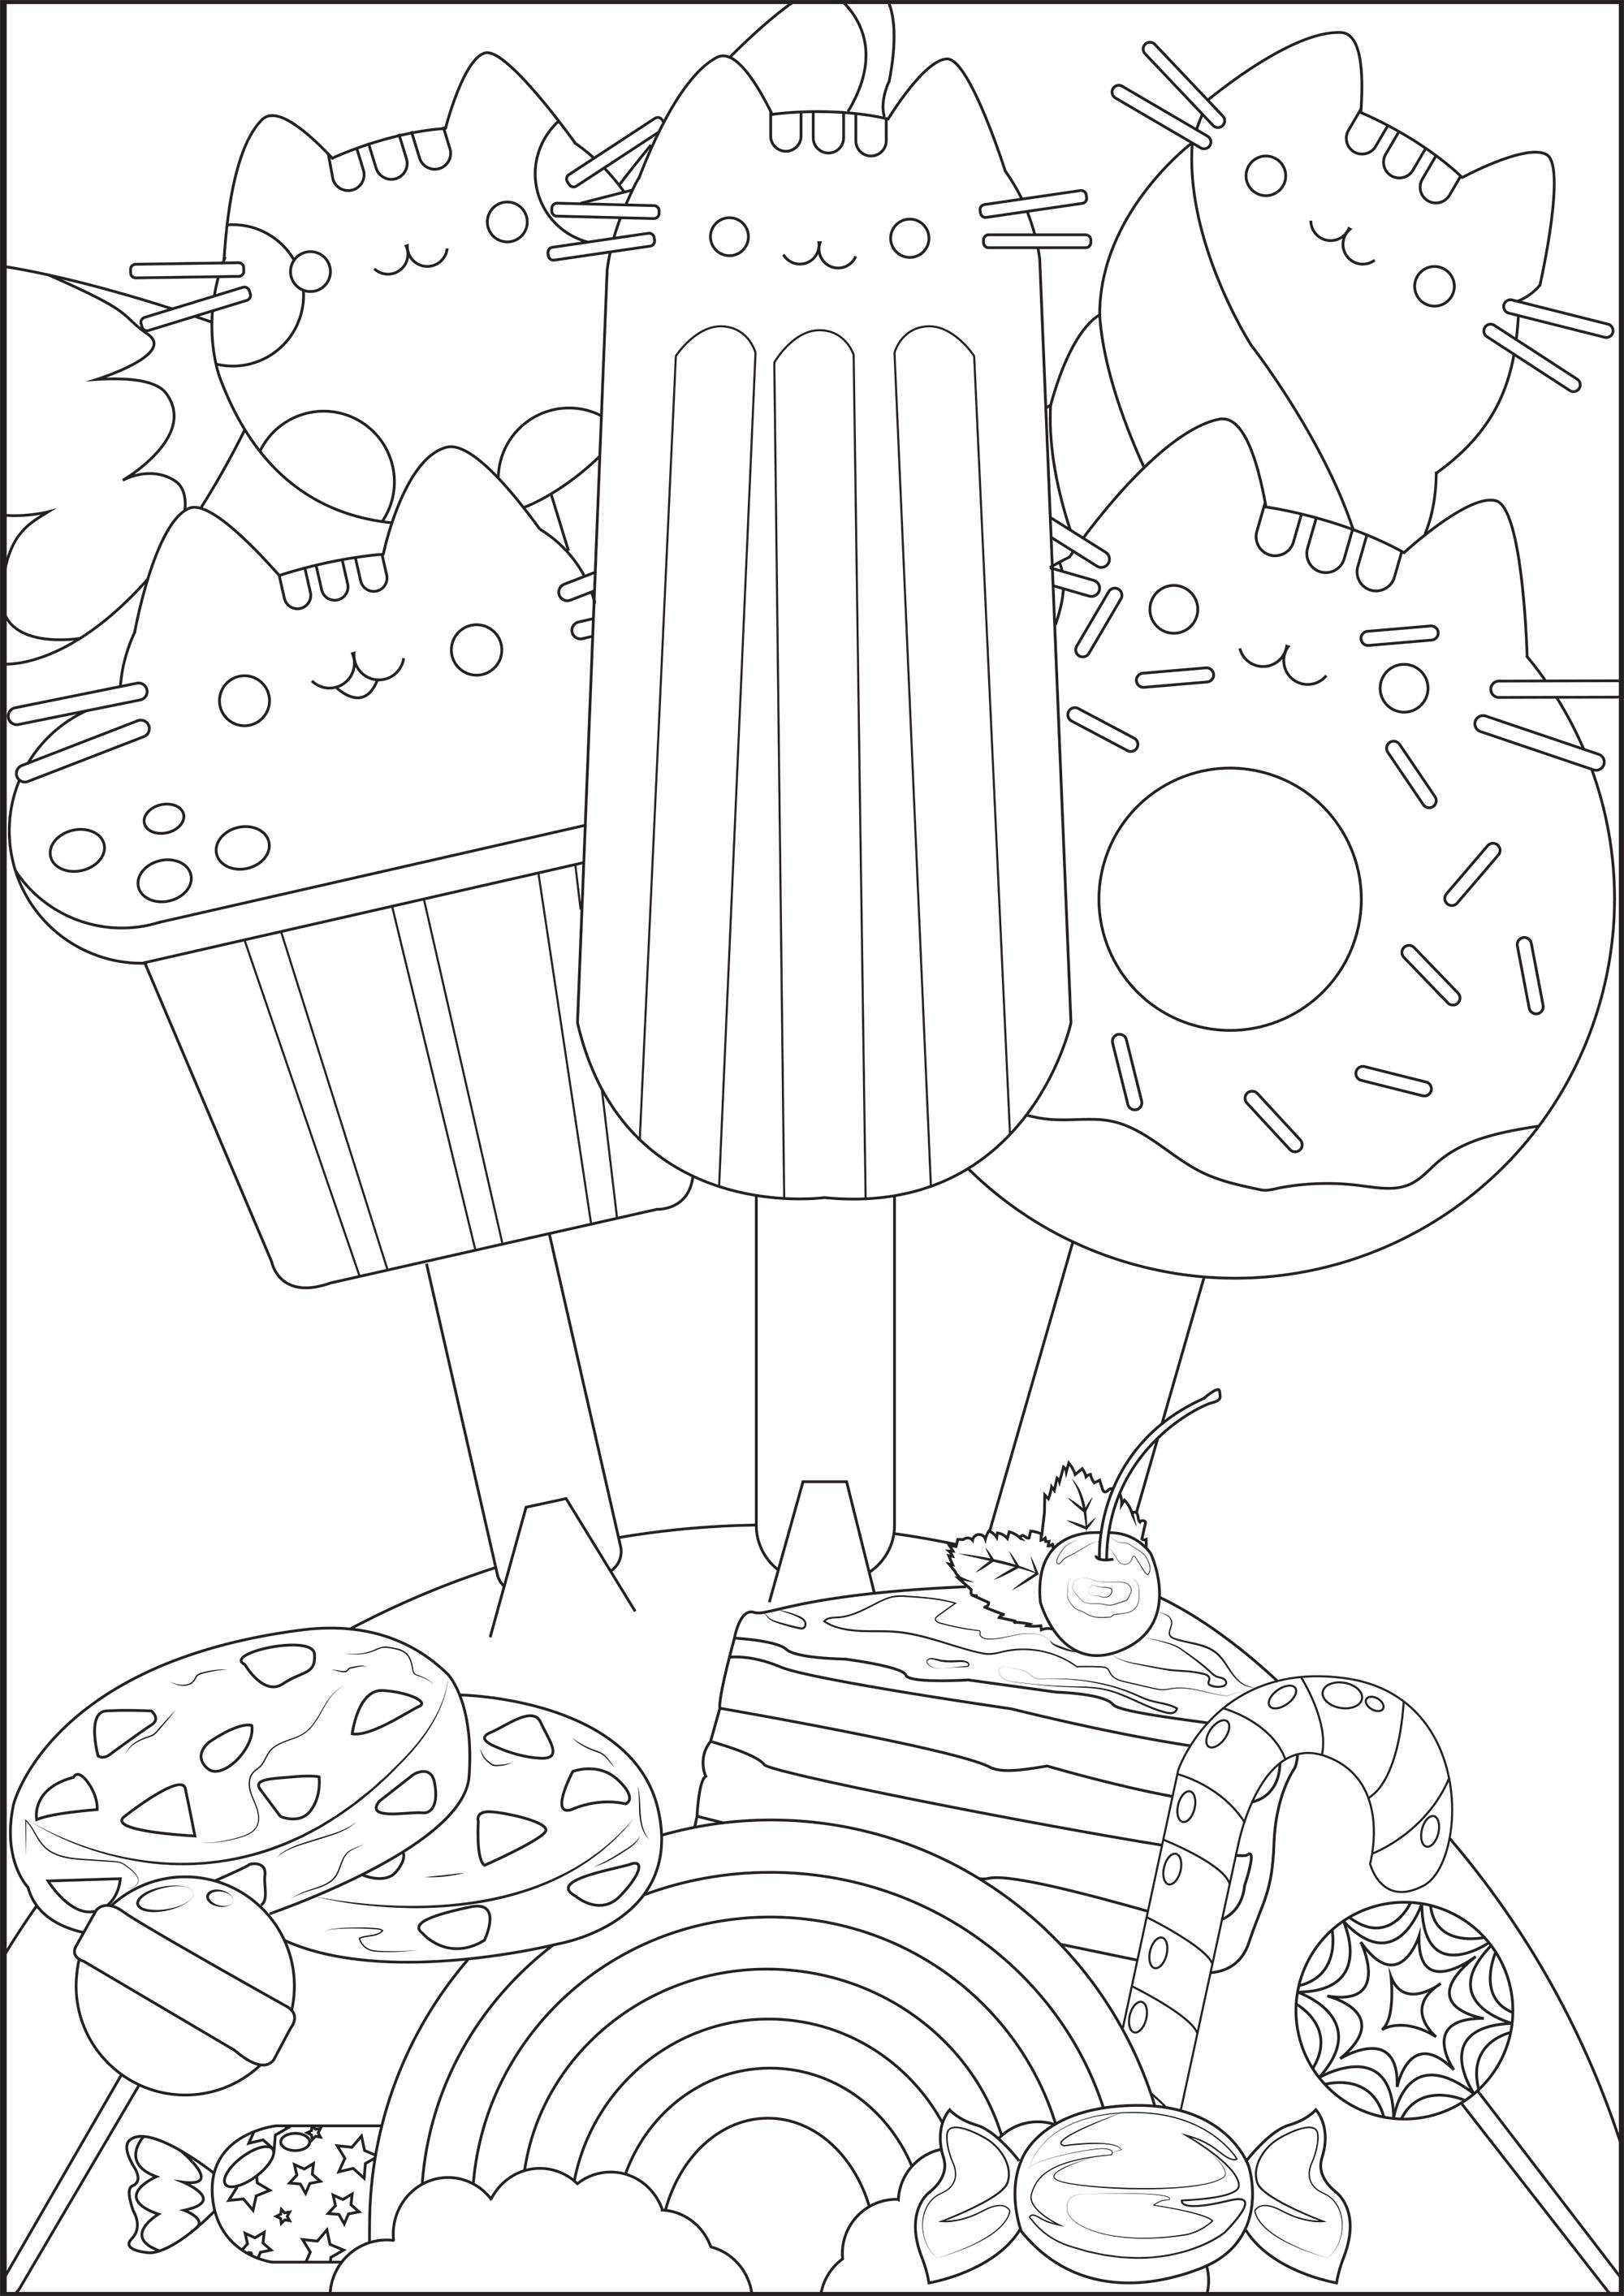 Doodle art doodling 71295